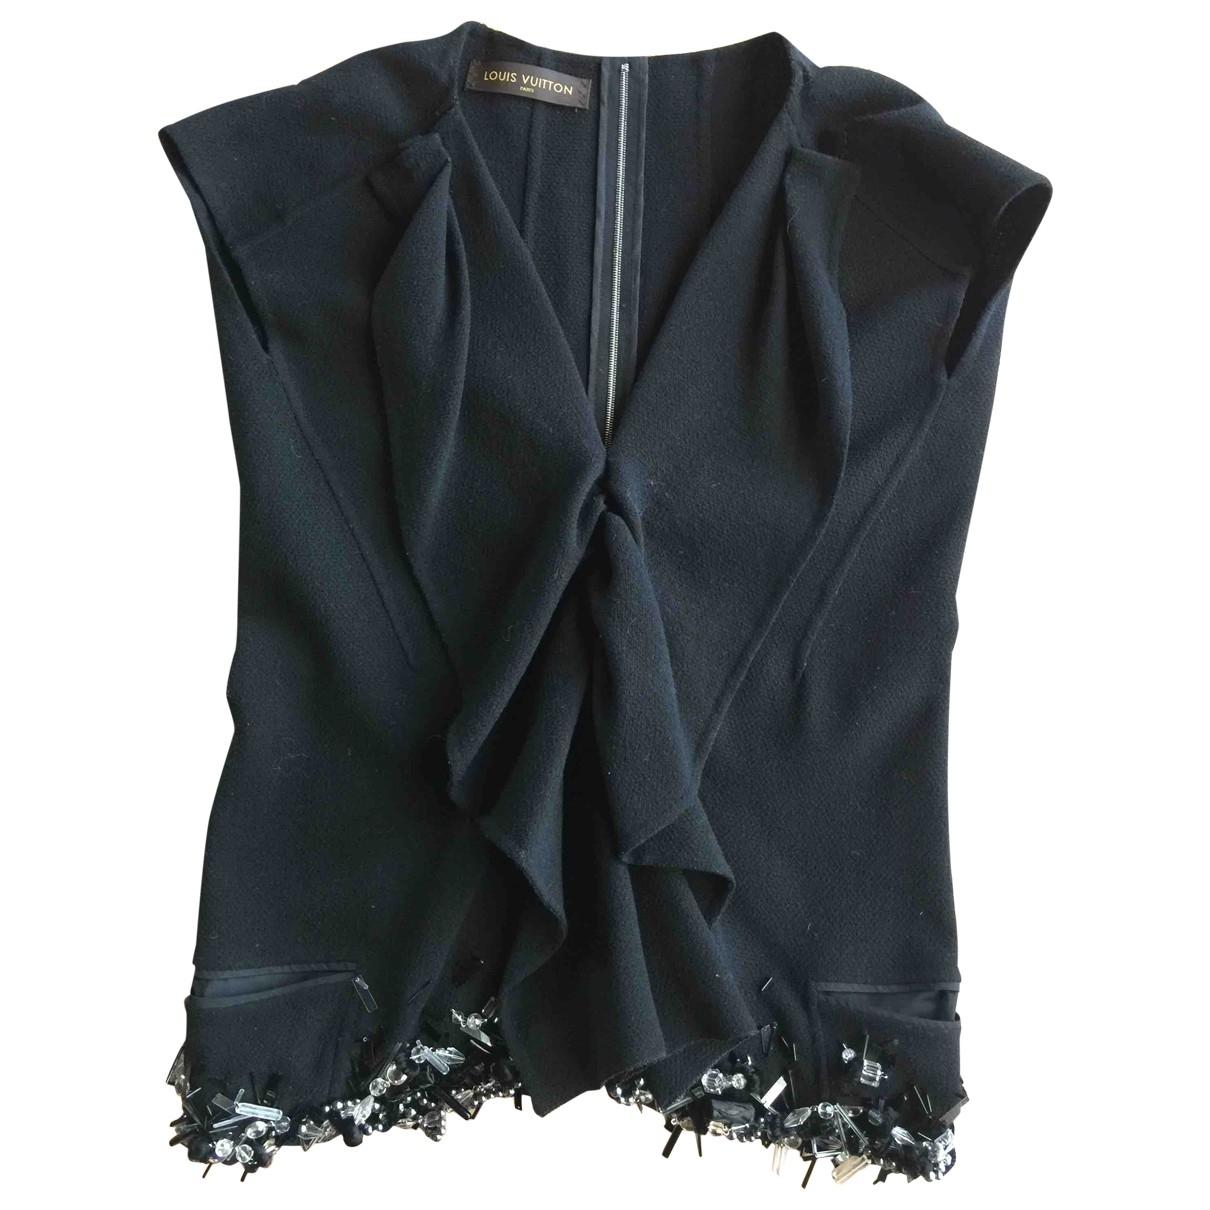 Louis Vuitton \N Black Wool  top for Women 38 FR